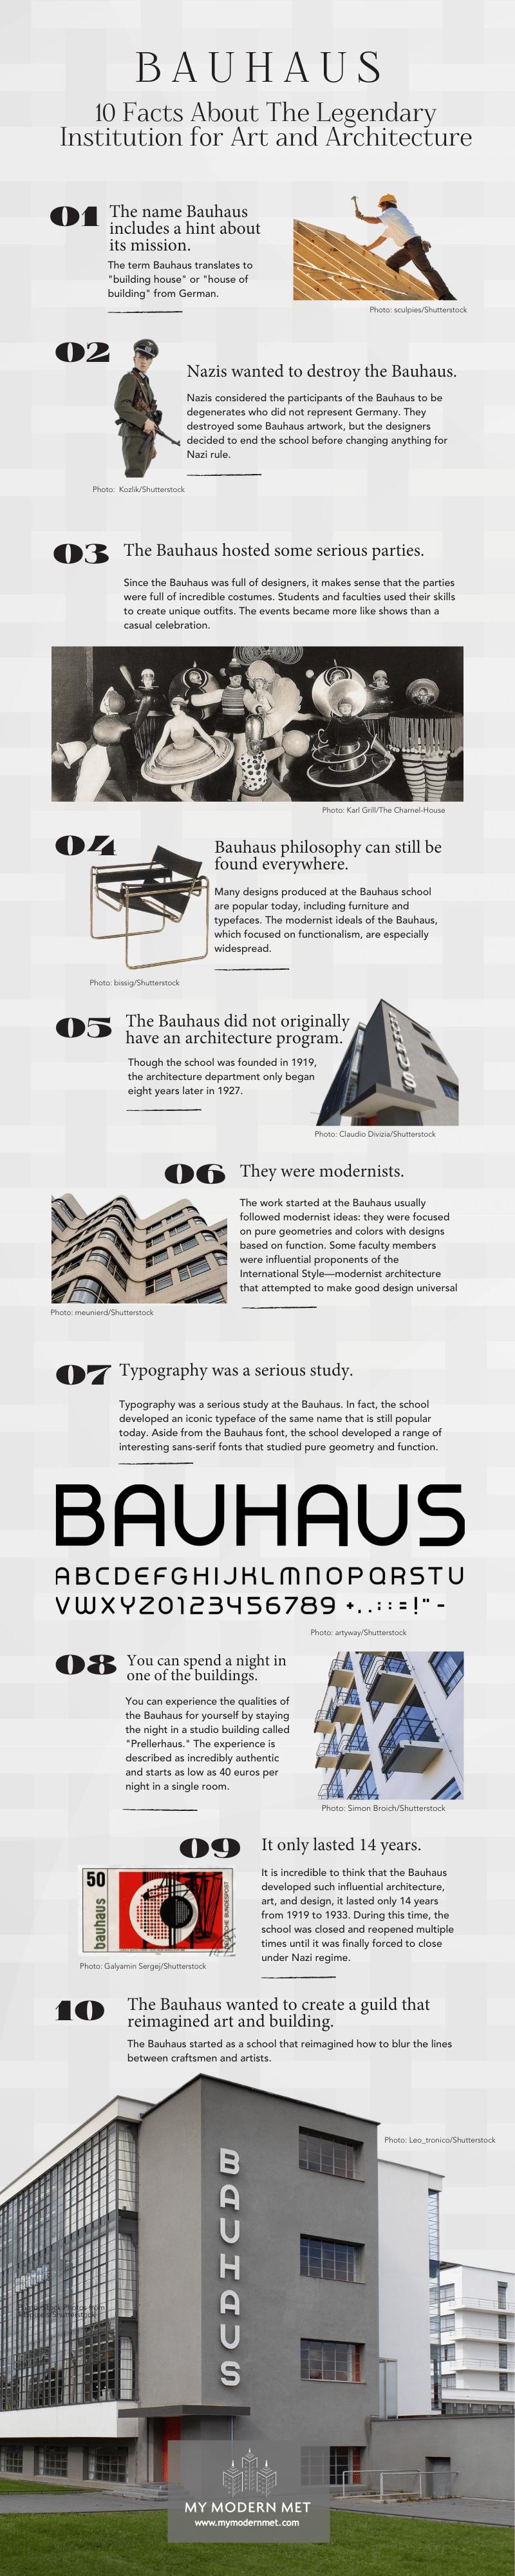 Bauhaus Infographic